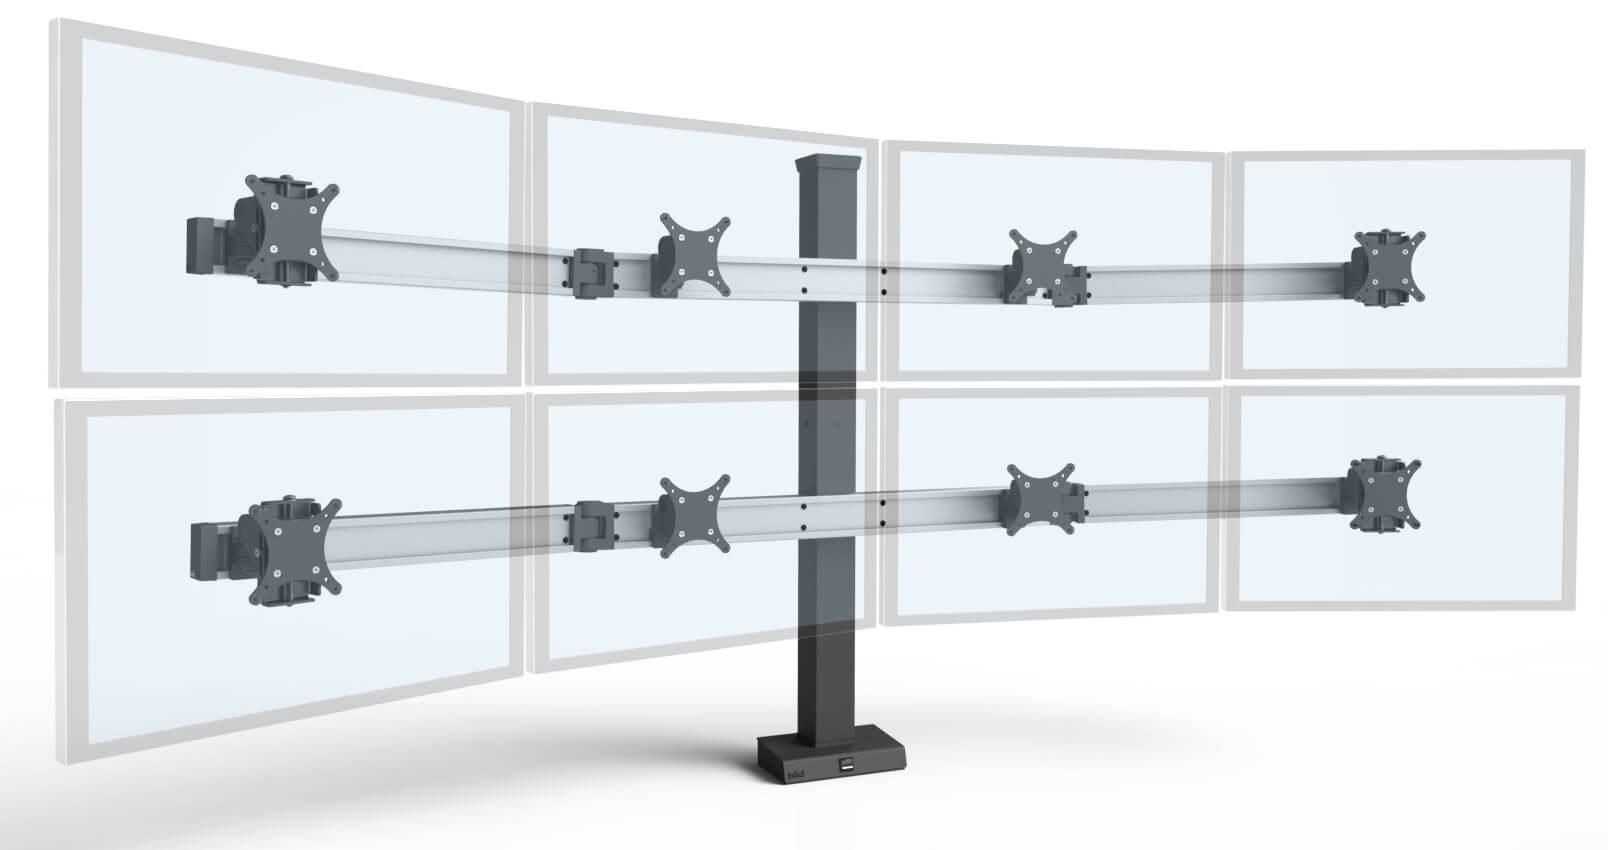 Bild-4-over-4 monitor mount system